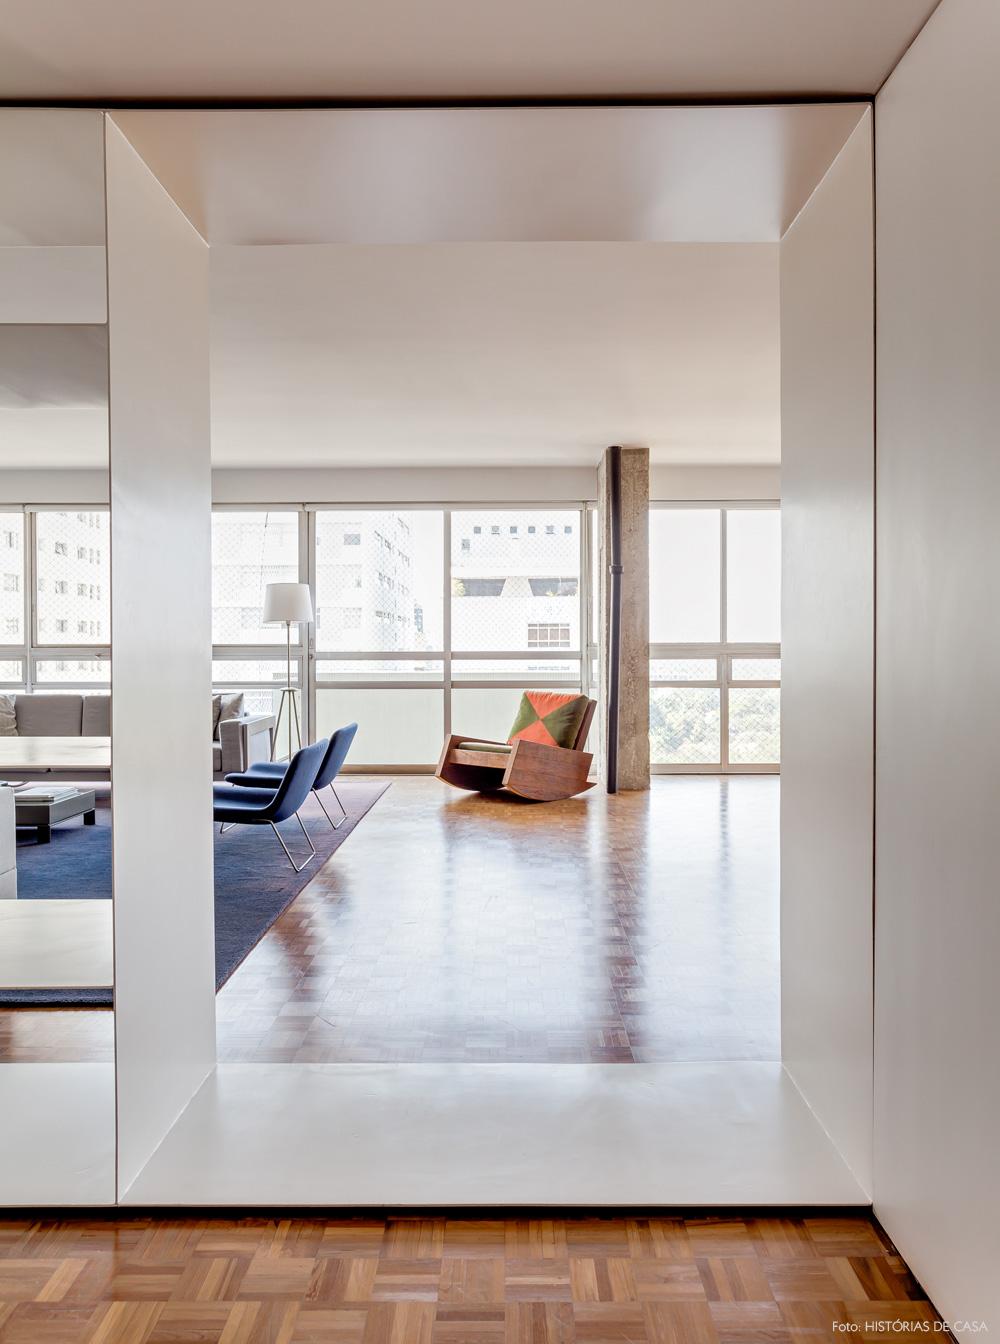 03-decoracao-apartamento-arquitetura-hall-entrada-branco-carlos-motta